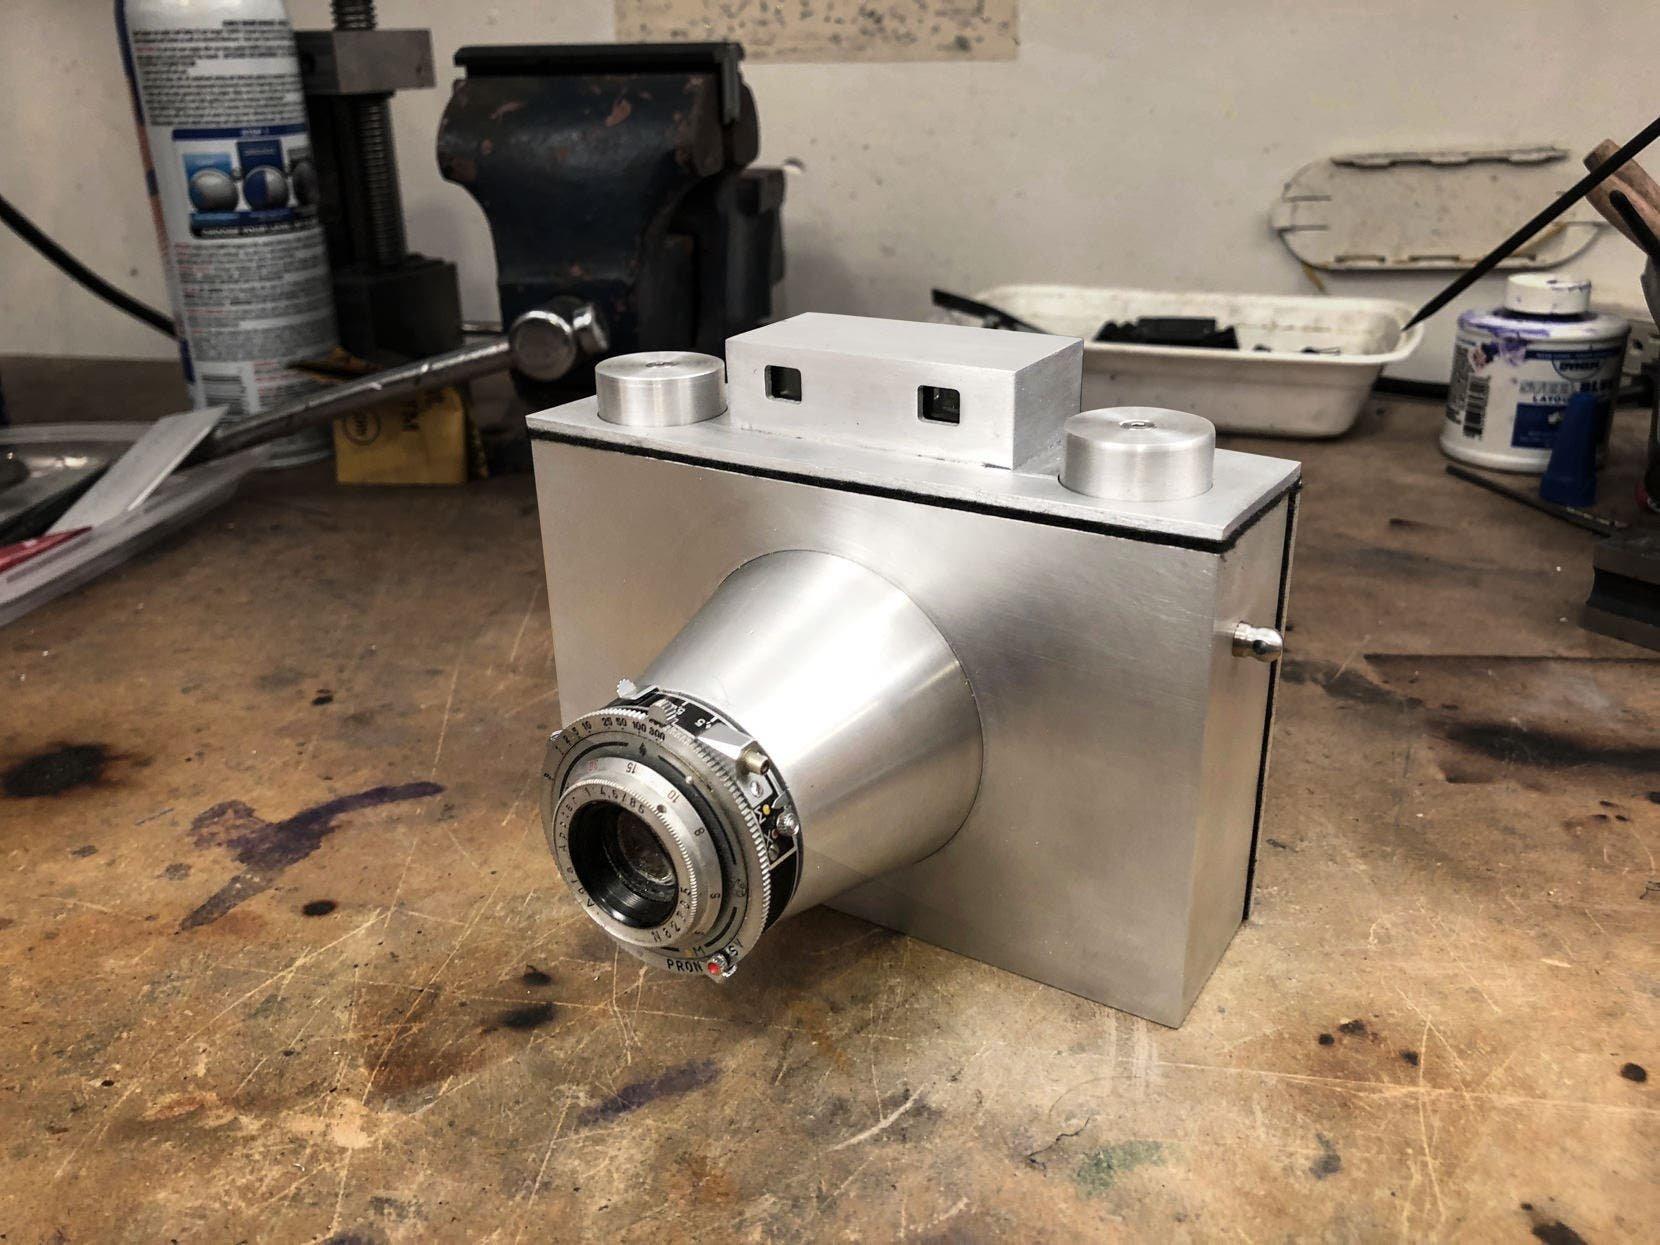 Check Out This All-Aluminum Handmade Medium Format Camera